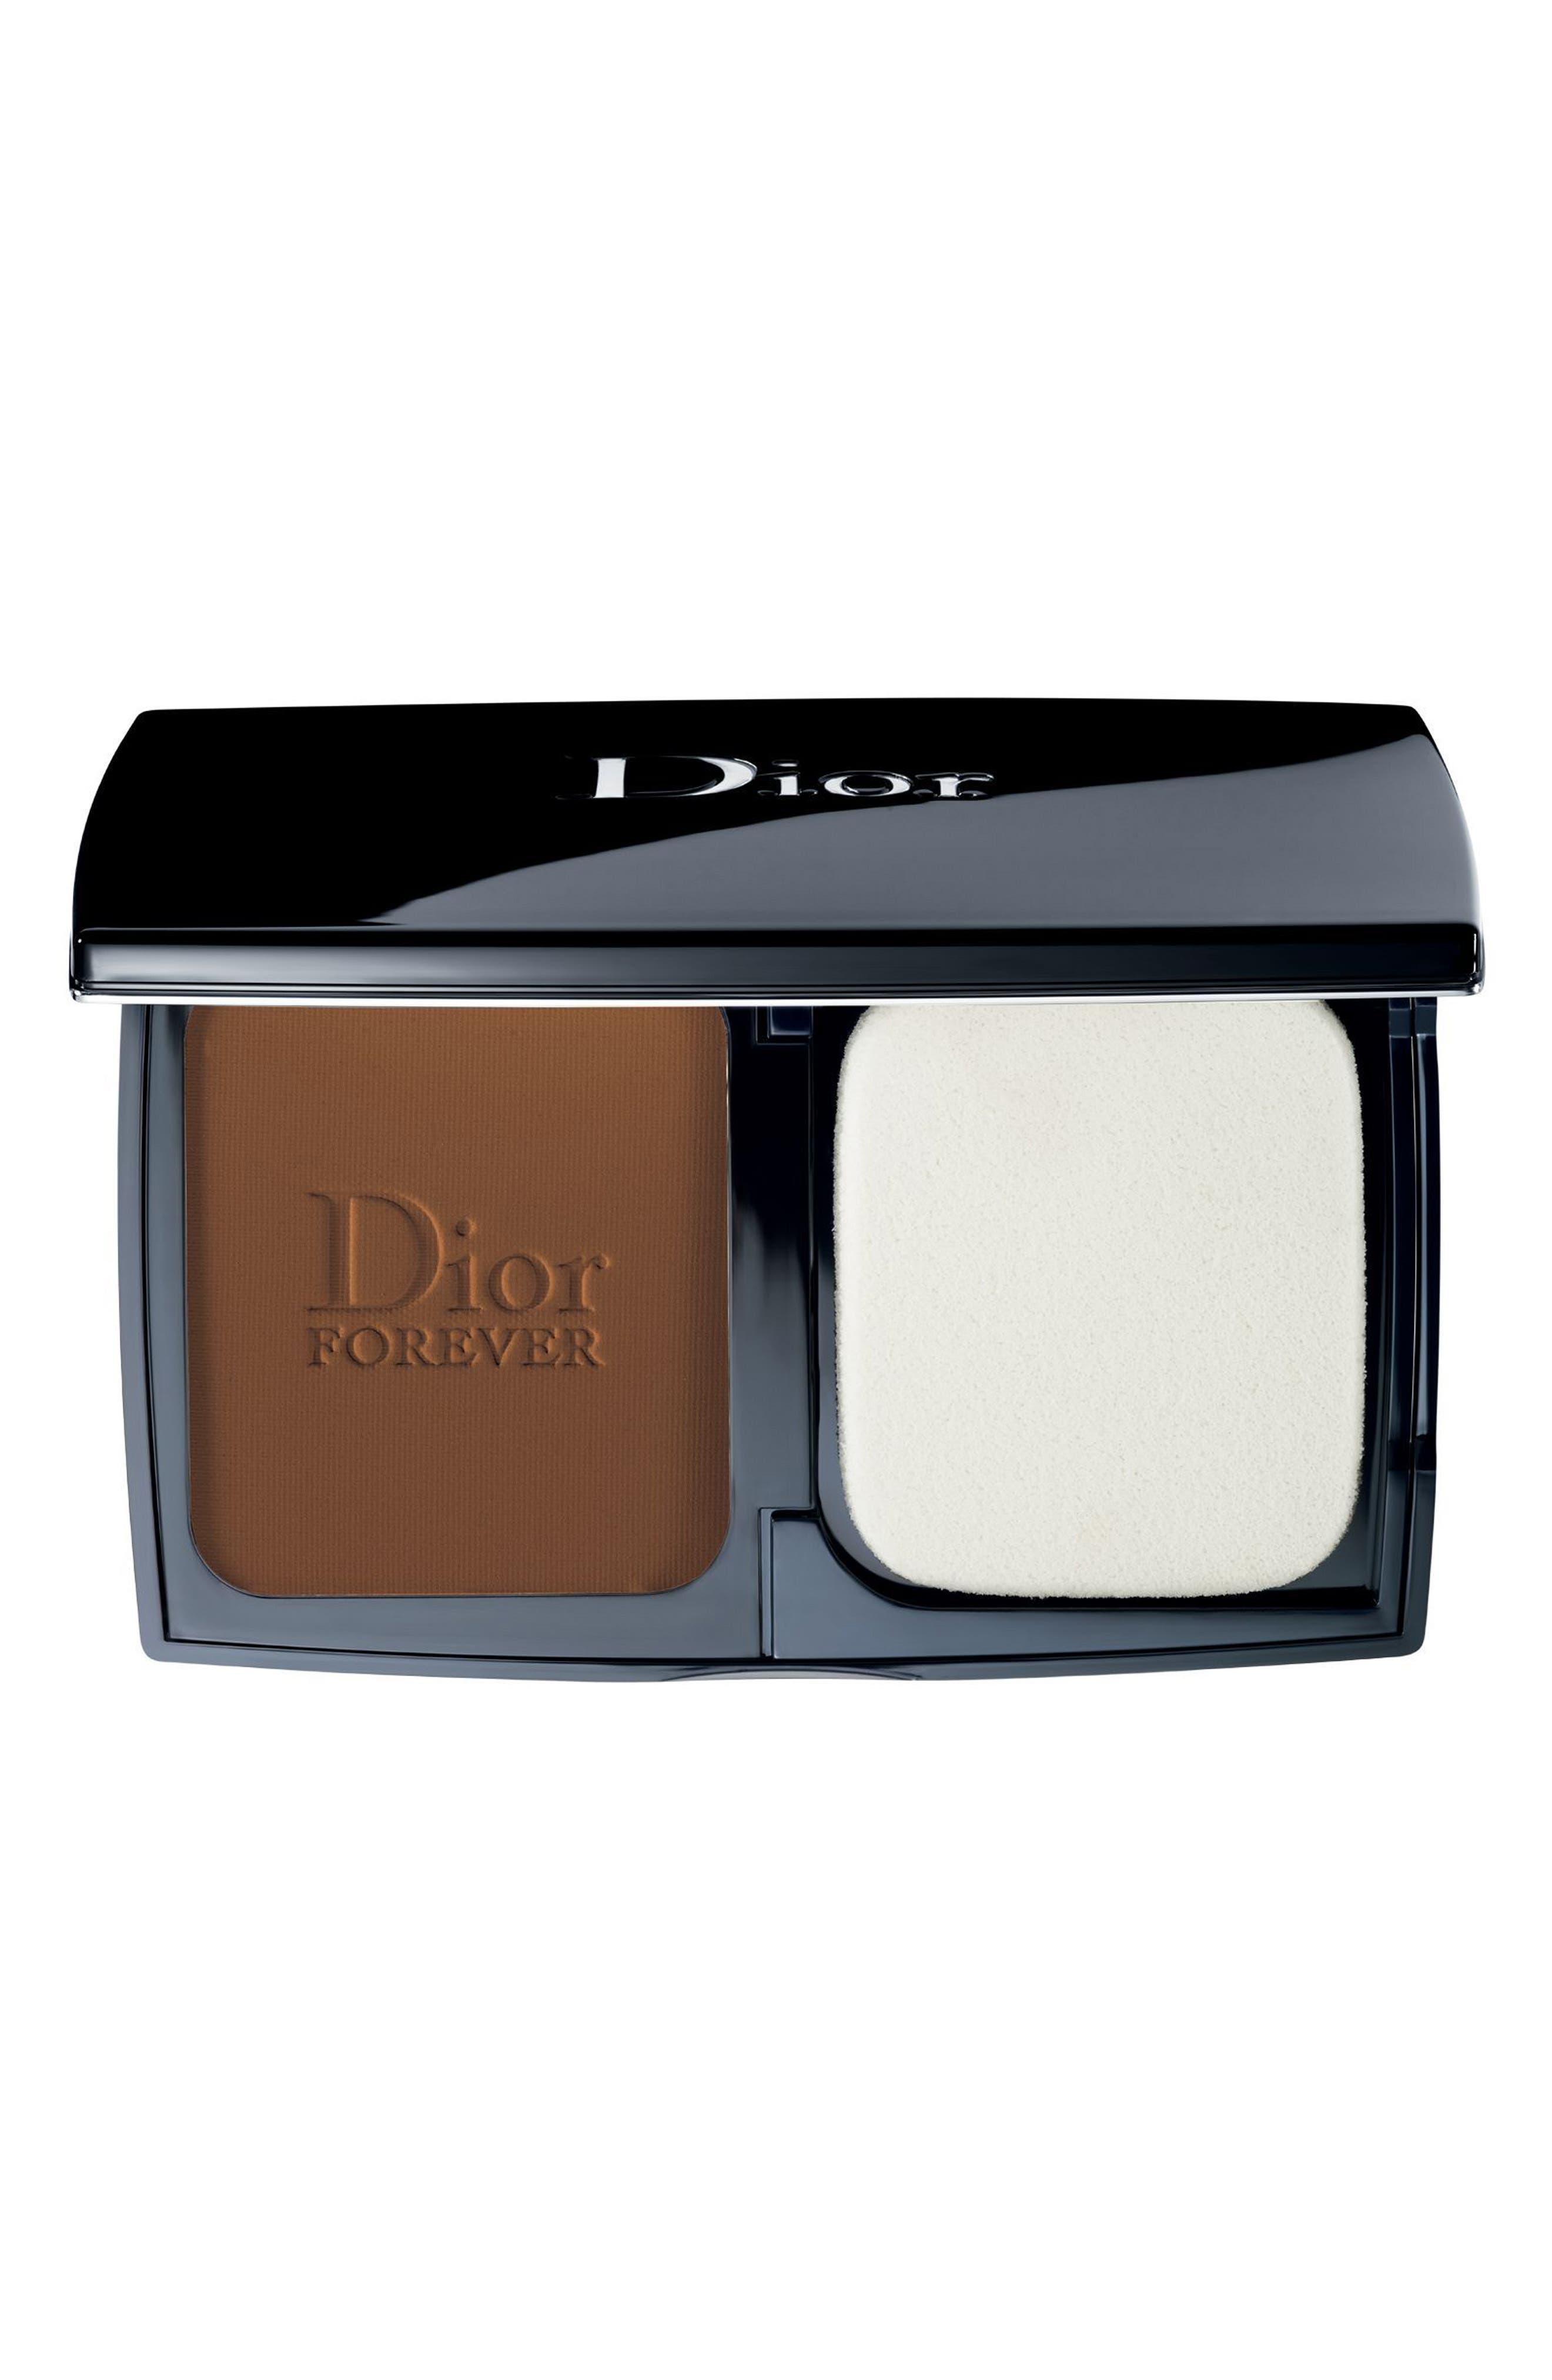 Dior Diorskin Forever Extreme Control - 080 Ebony